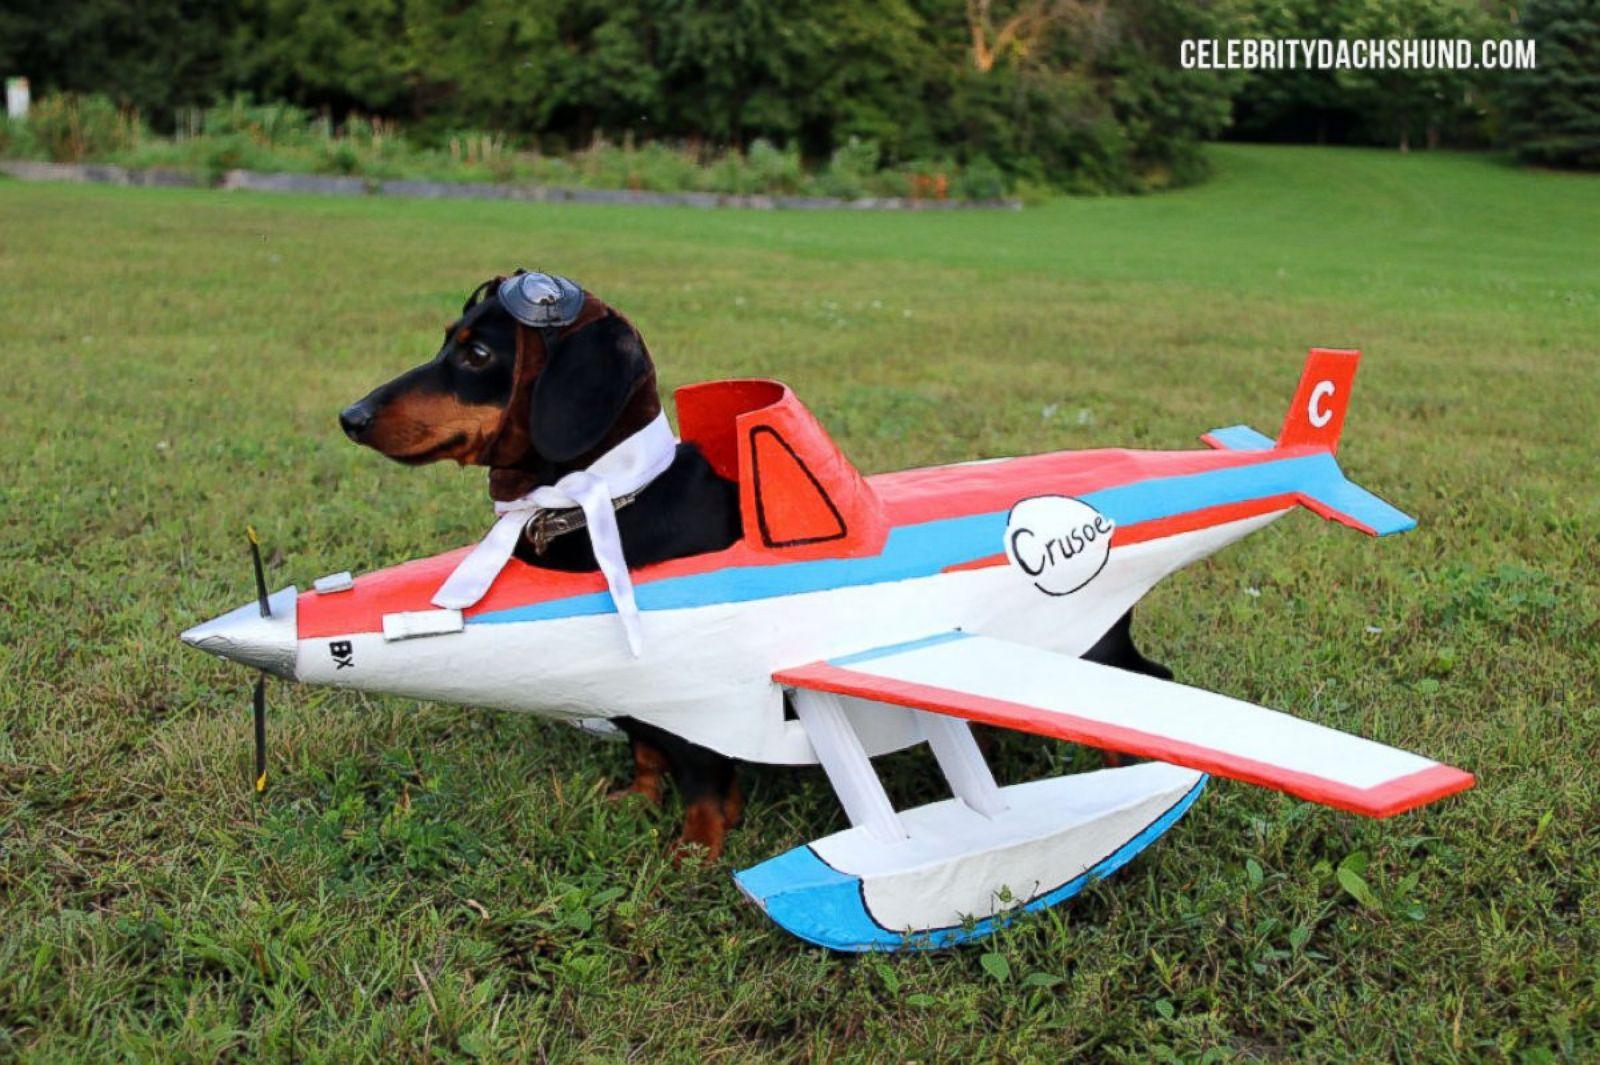 Weiner Dog Halloween Costumes.10 Amazing Pet Halloween Costumes Photos Abc News